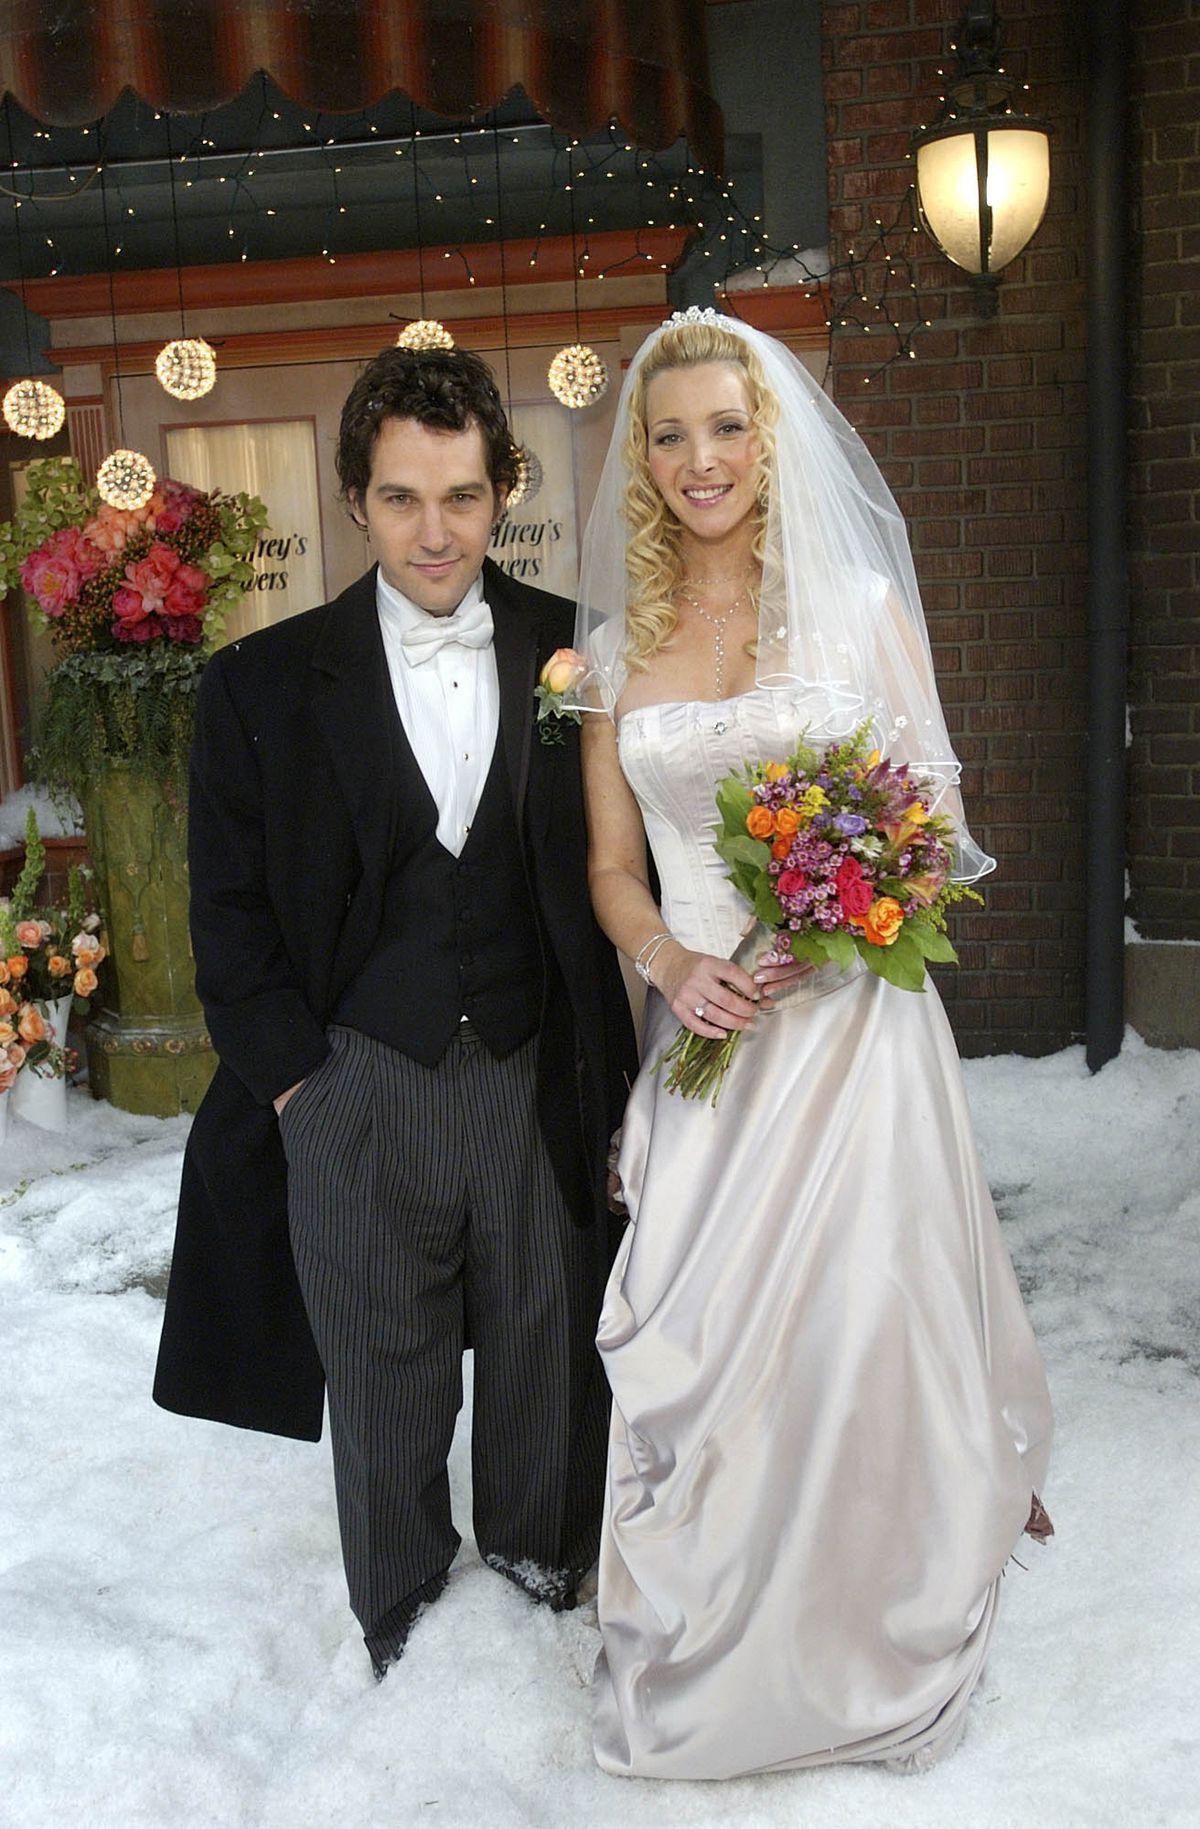 Friends Costume Designer Looks Back On 10 Seasons Of Weddings Racked